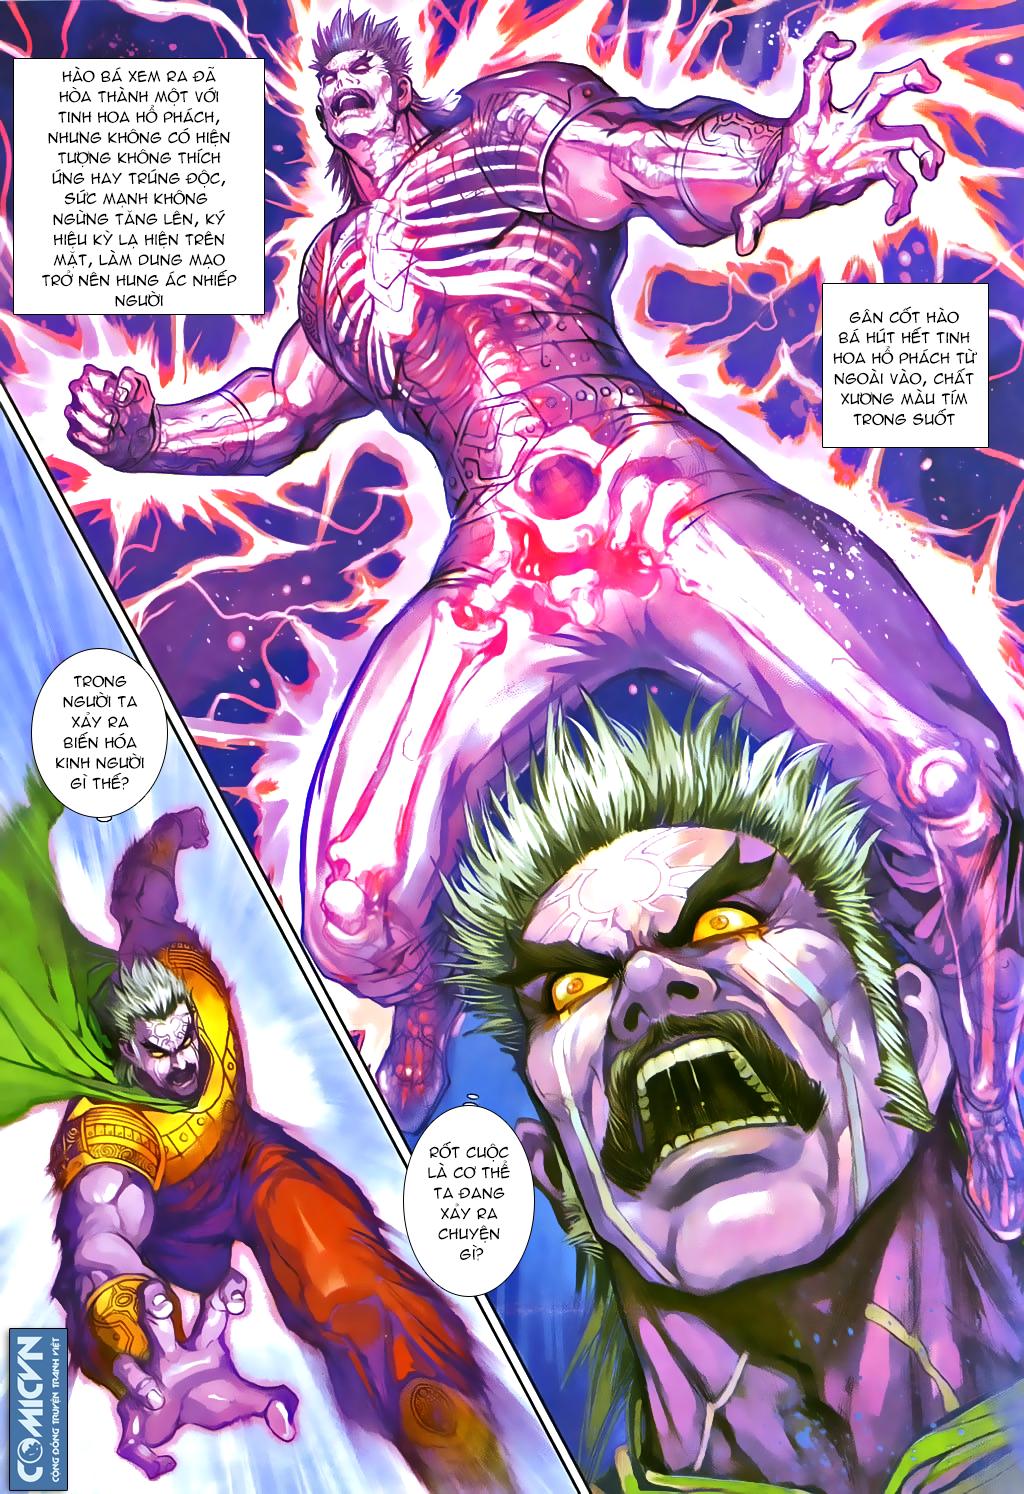 Thần binh huyền kỳ 3 - 3.5 Chapter 82 - Hamtruyen.vn